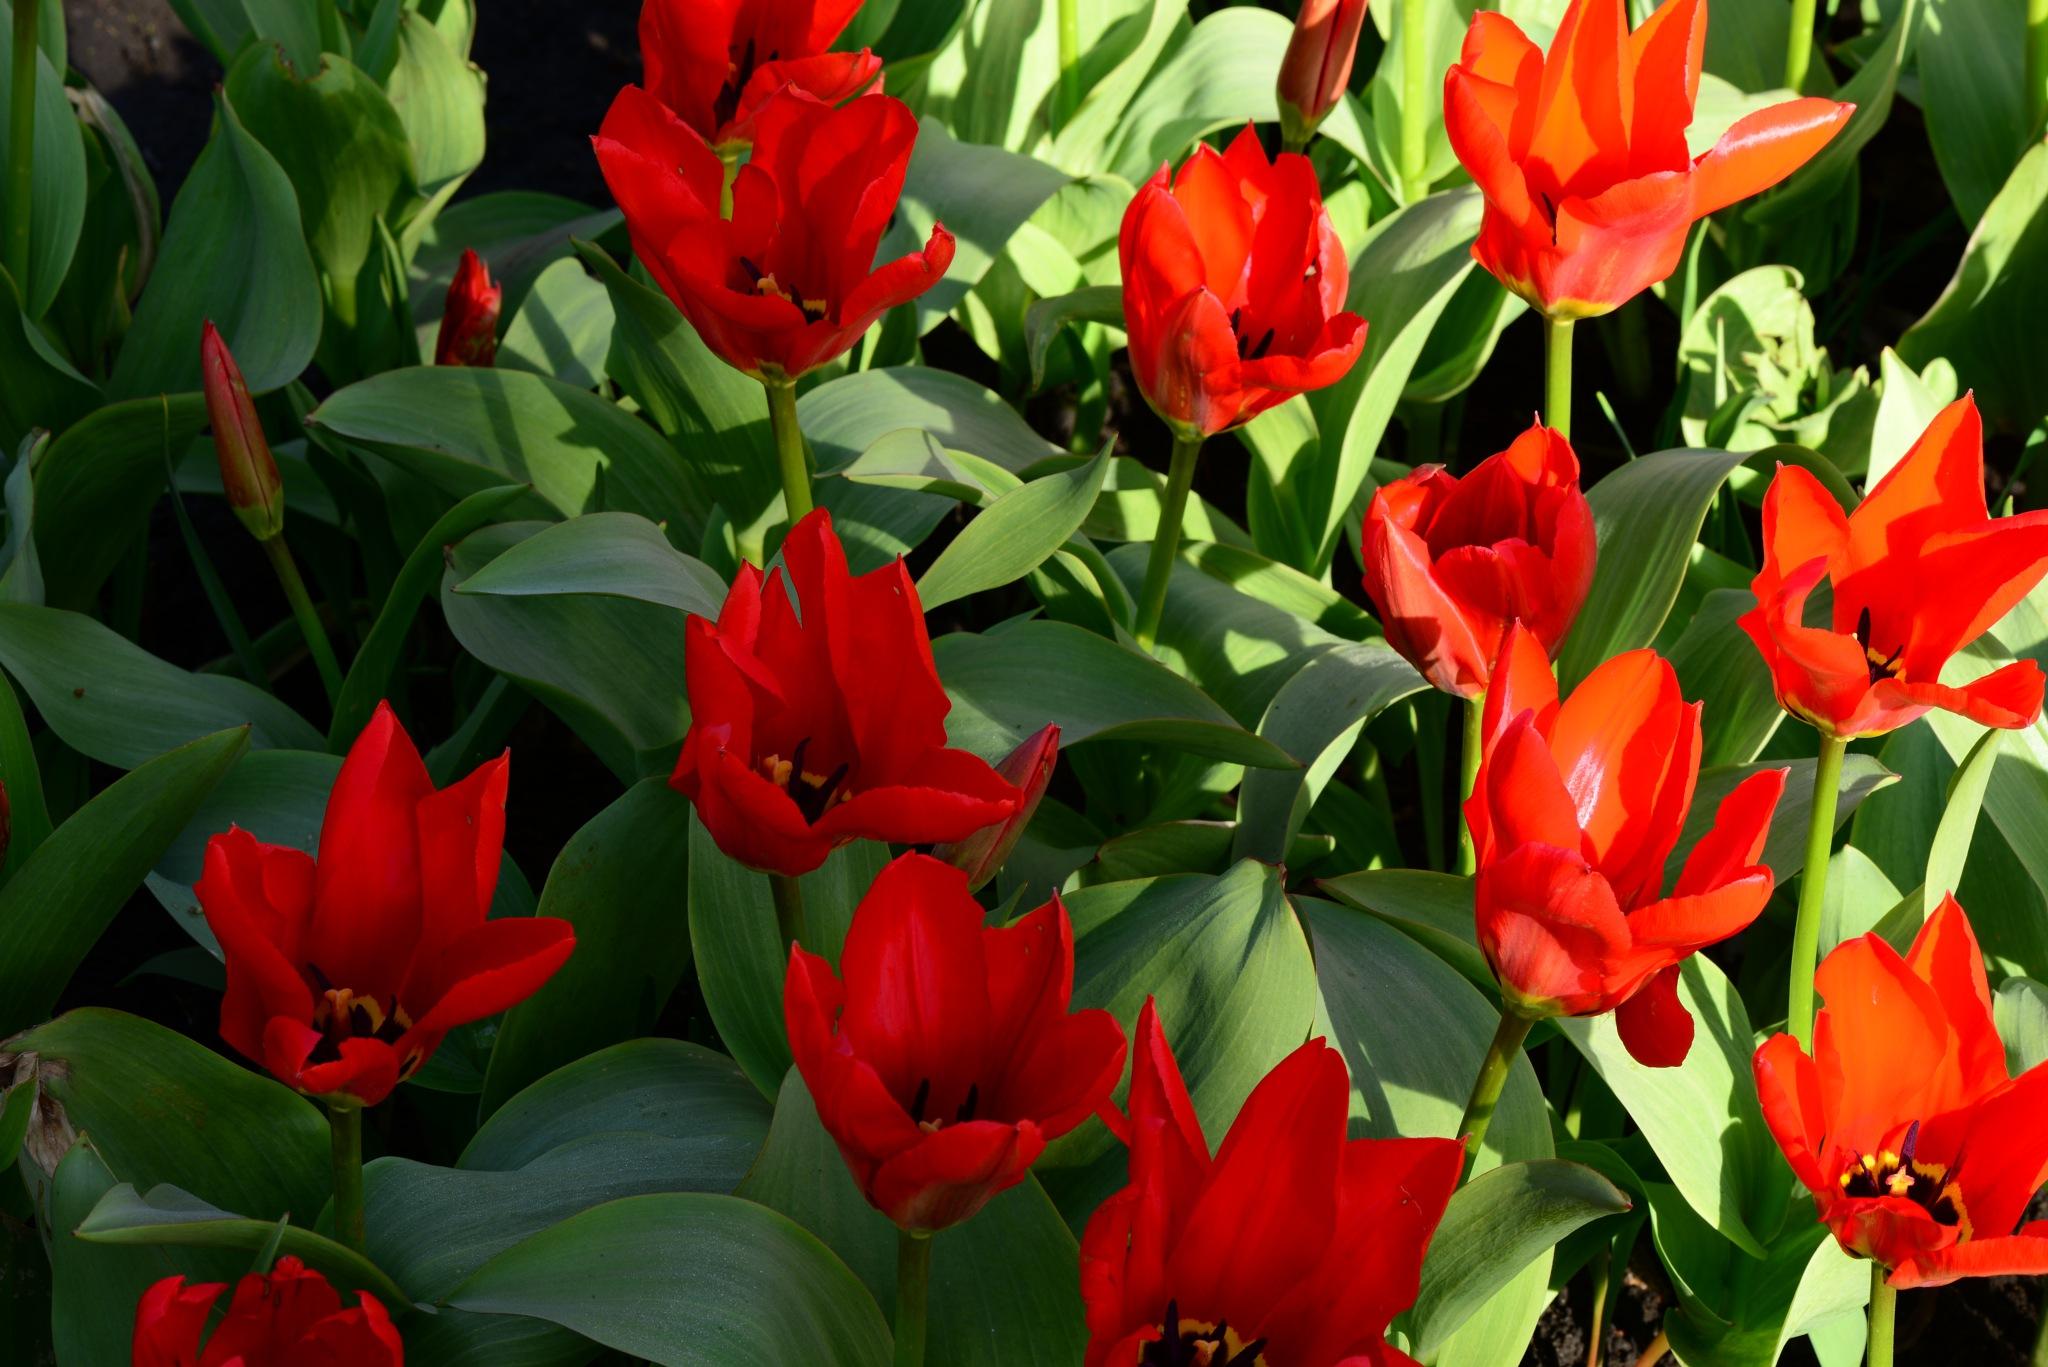 bright red flowers blooming tulips in the spring in city park by SergeiKudriavtcev